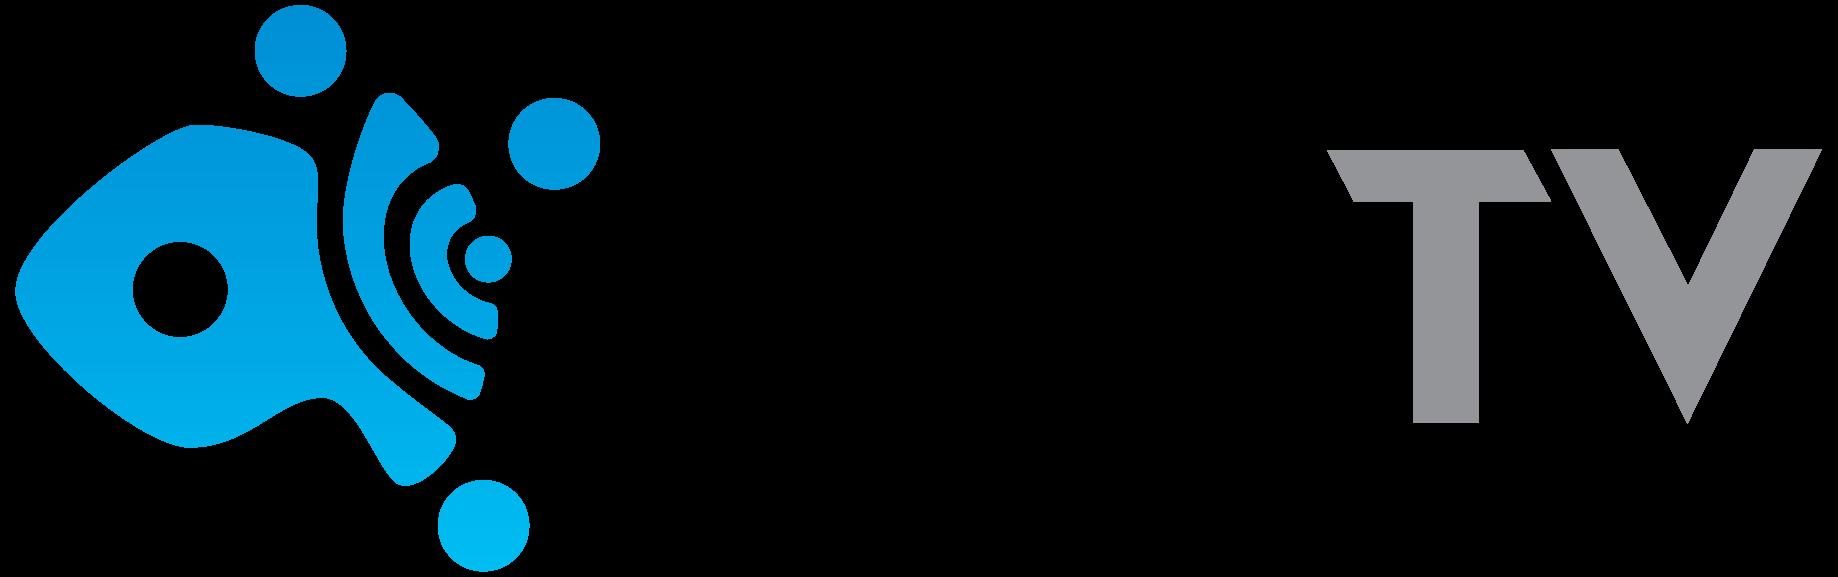 ACCTV_logo.png